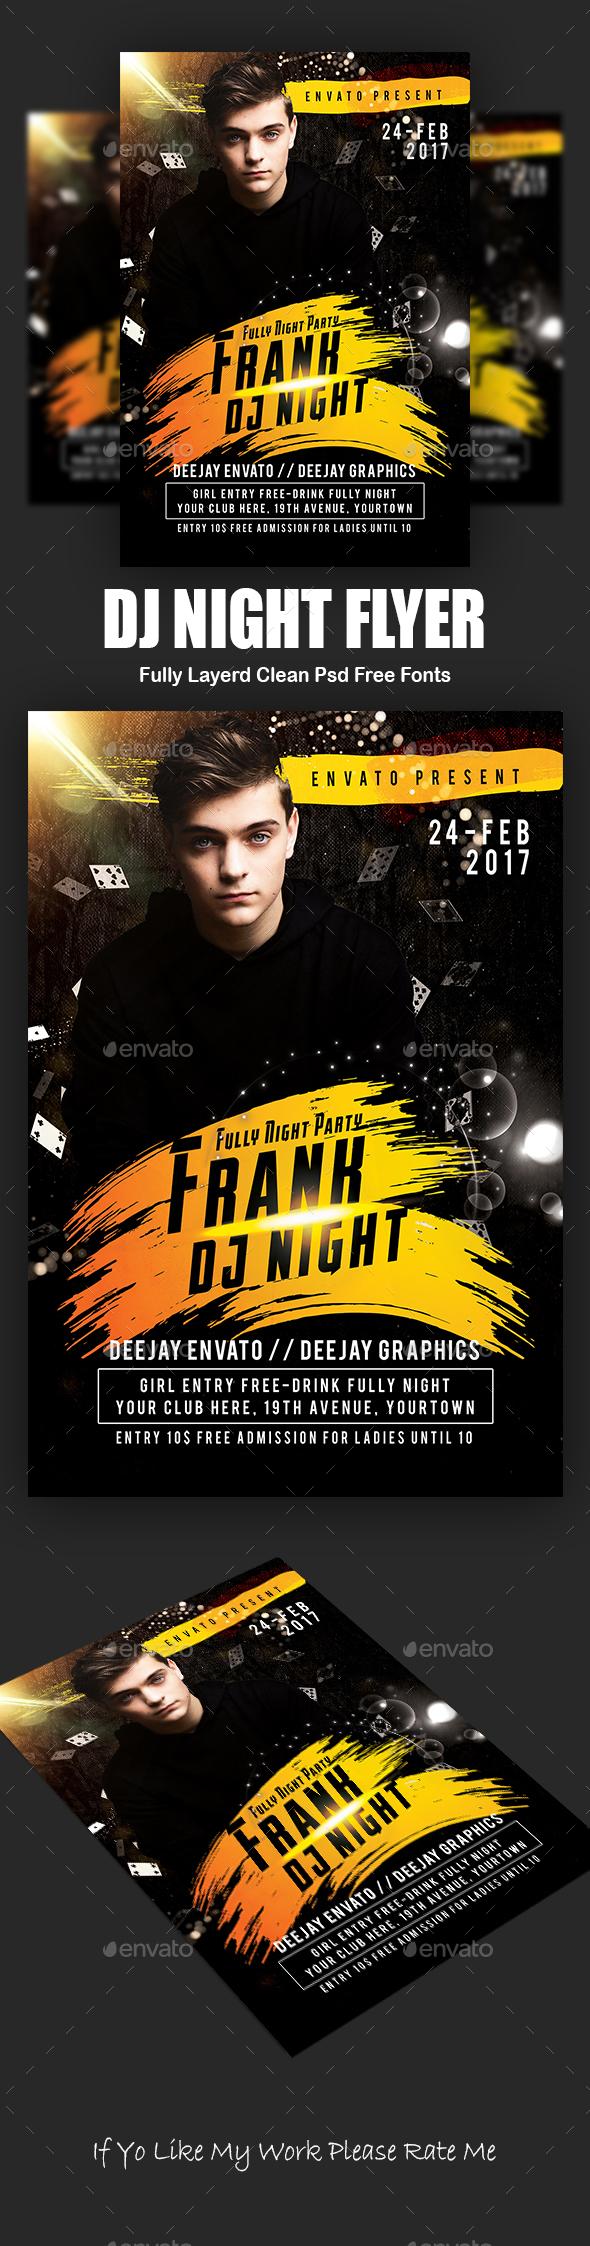 DJ Night Flyer - Events Flyers